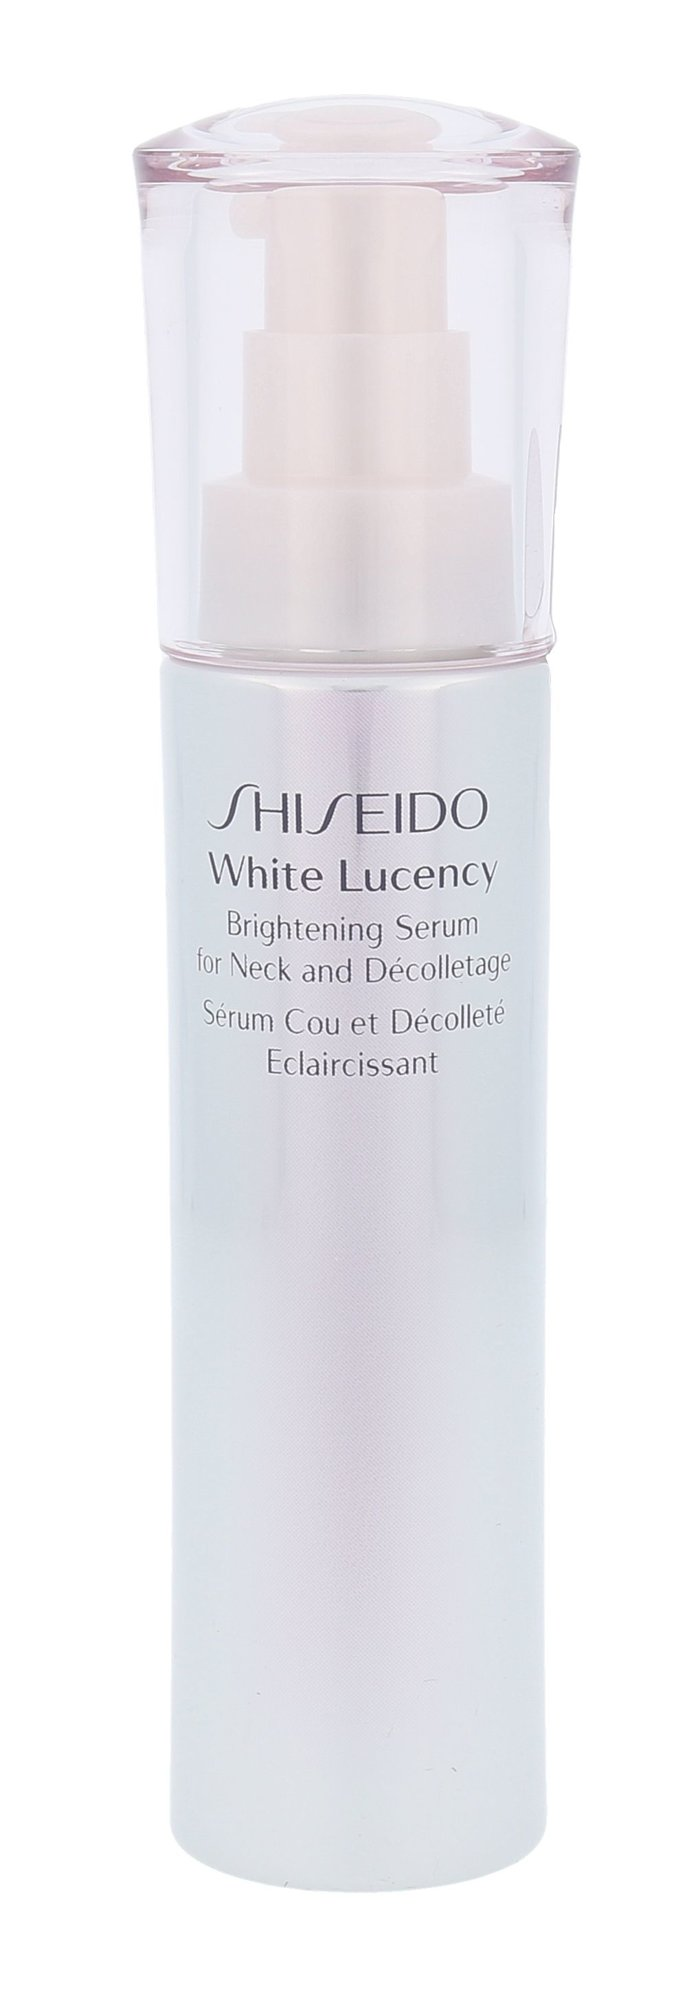 Shiseido White Lucency Brightening Serum Neck & Decollete Cosmetic 75ml